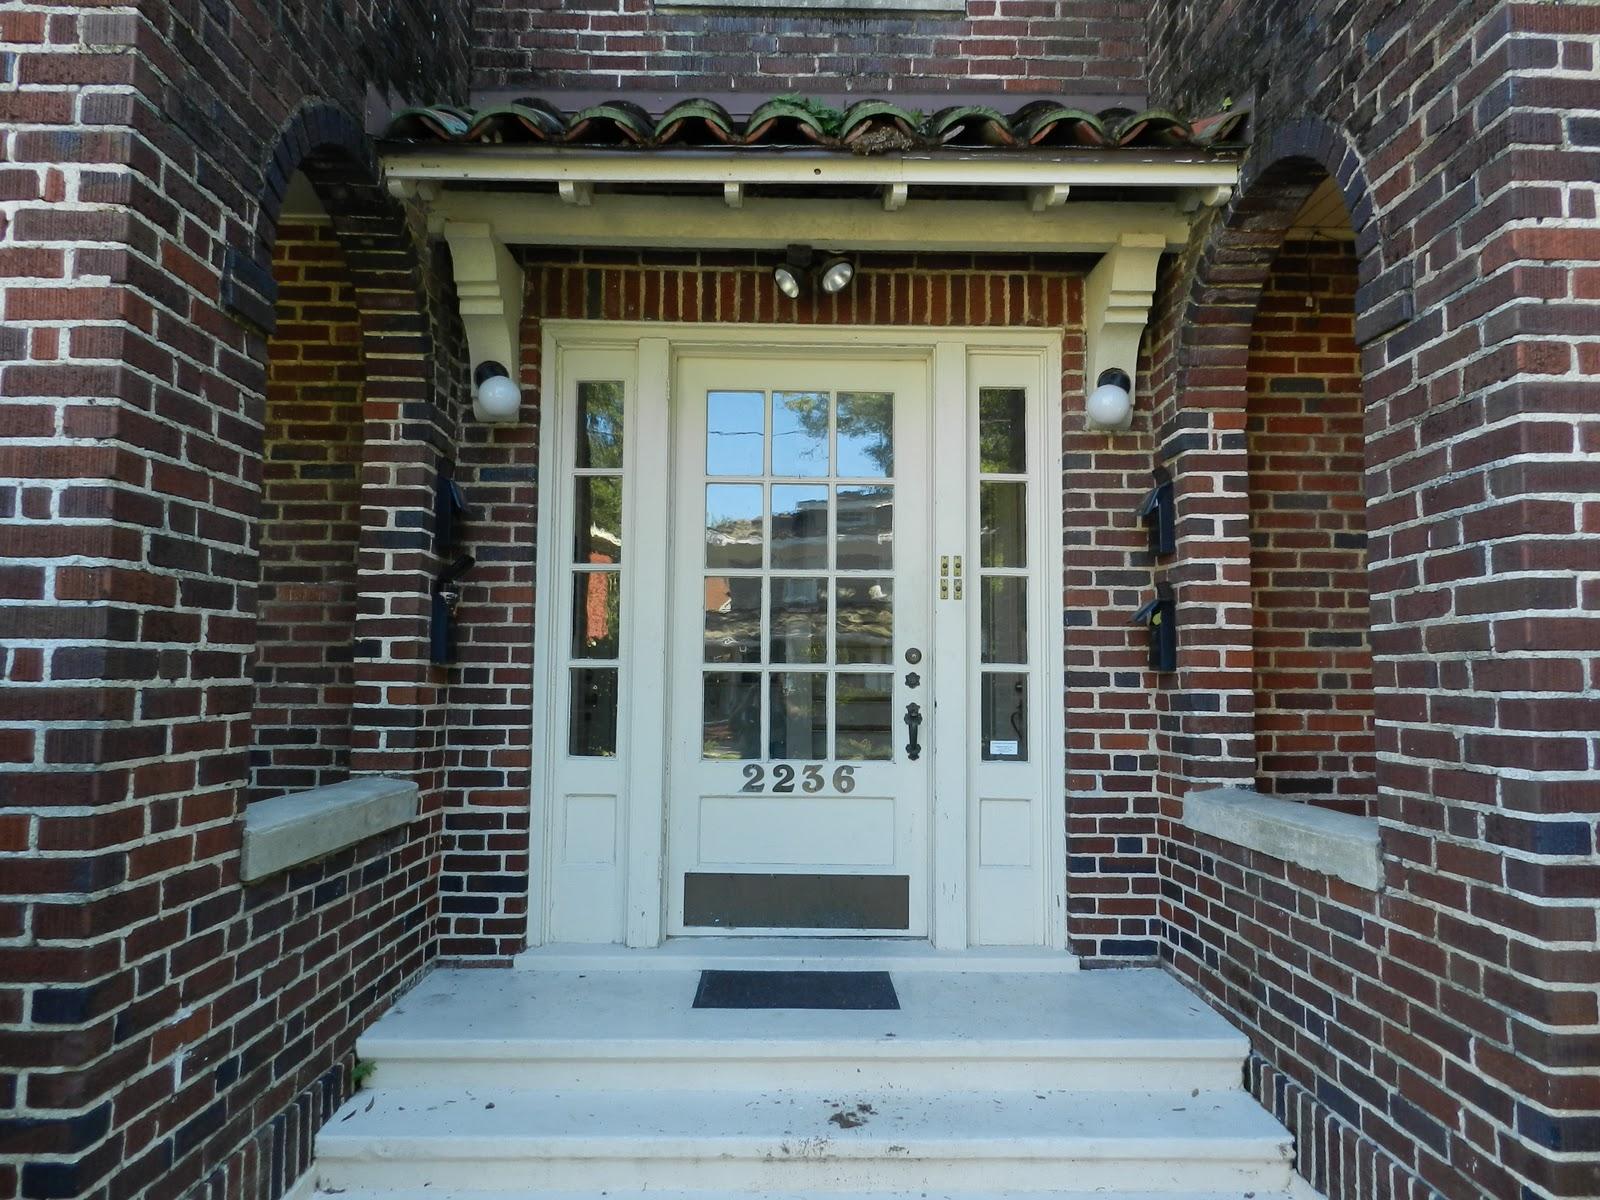 Apartment Building Door mike's historic buildings: st. johns quarter: 4-plex with a river view